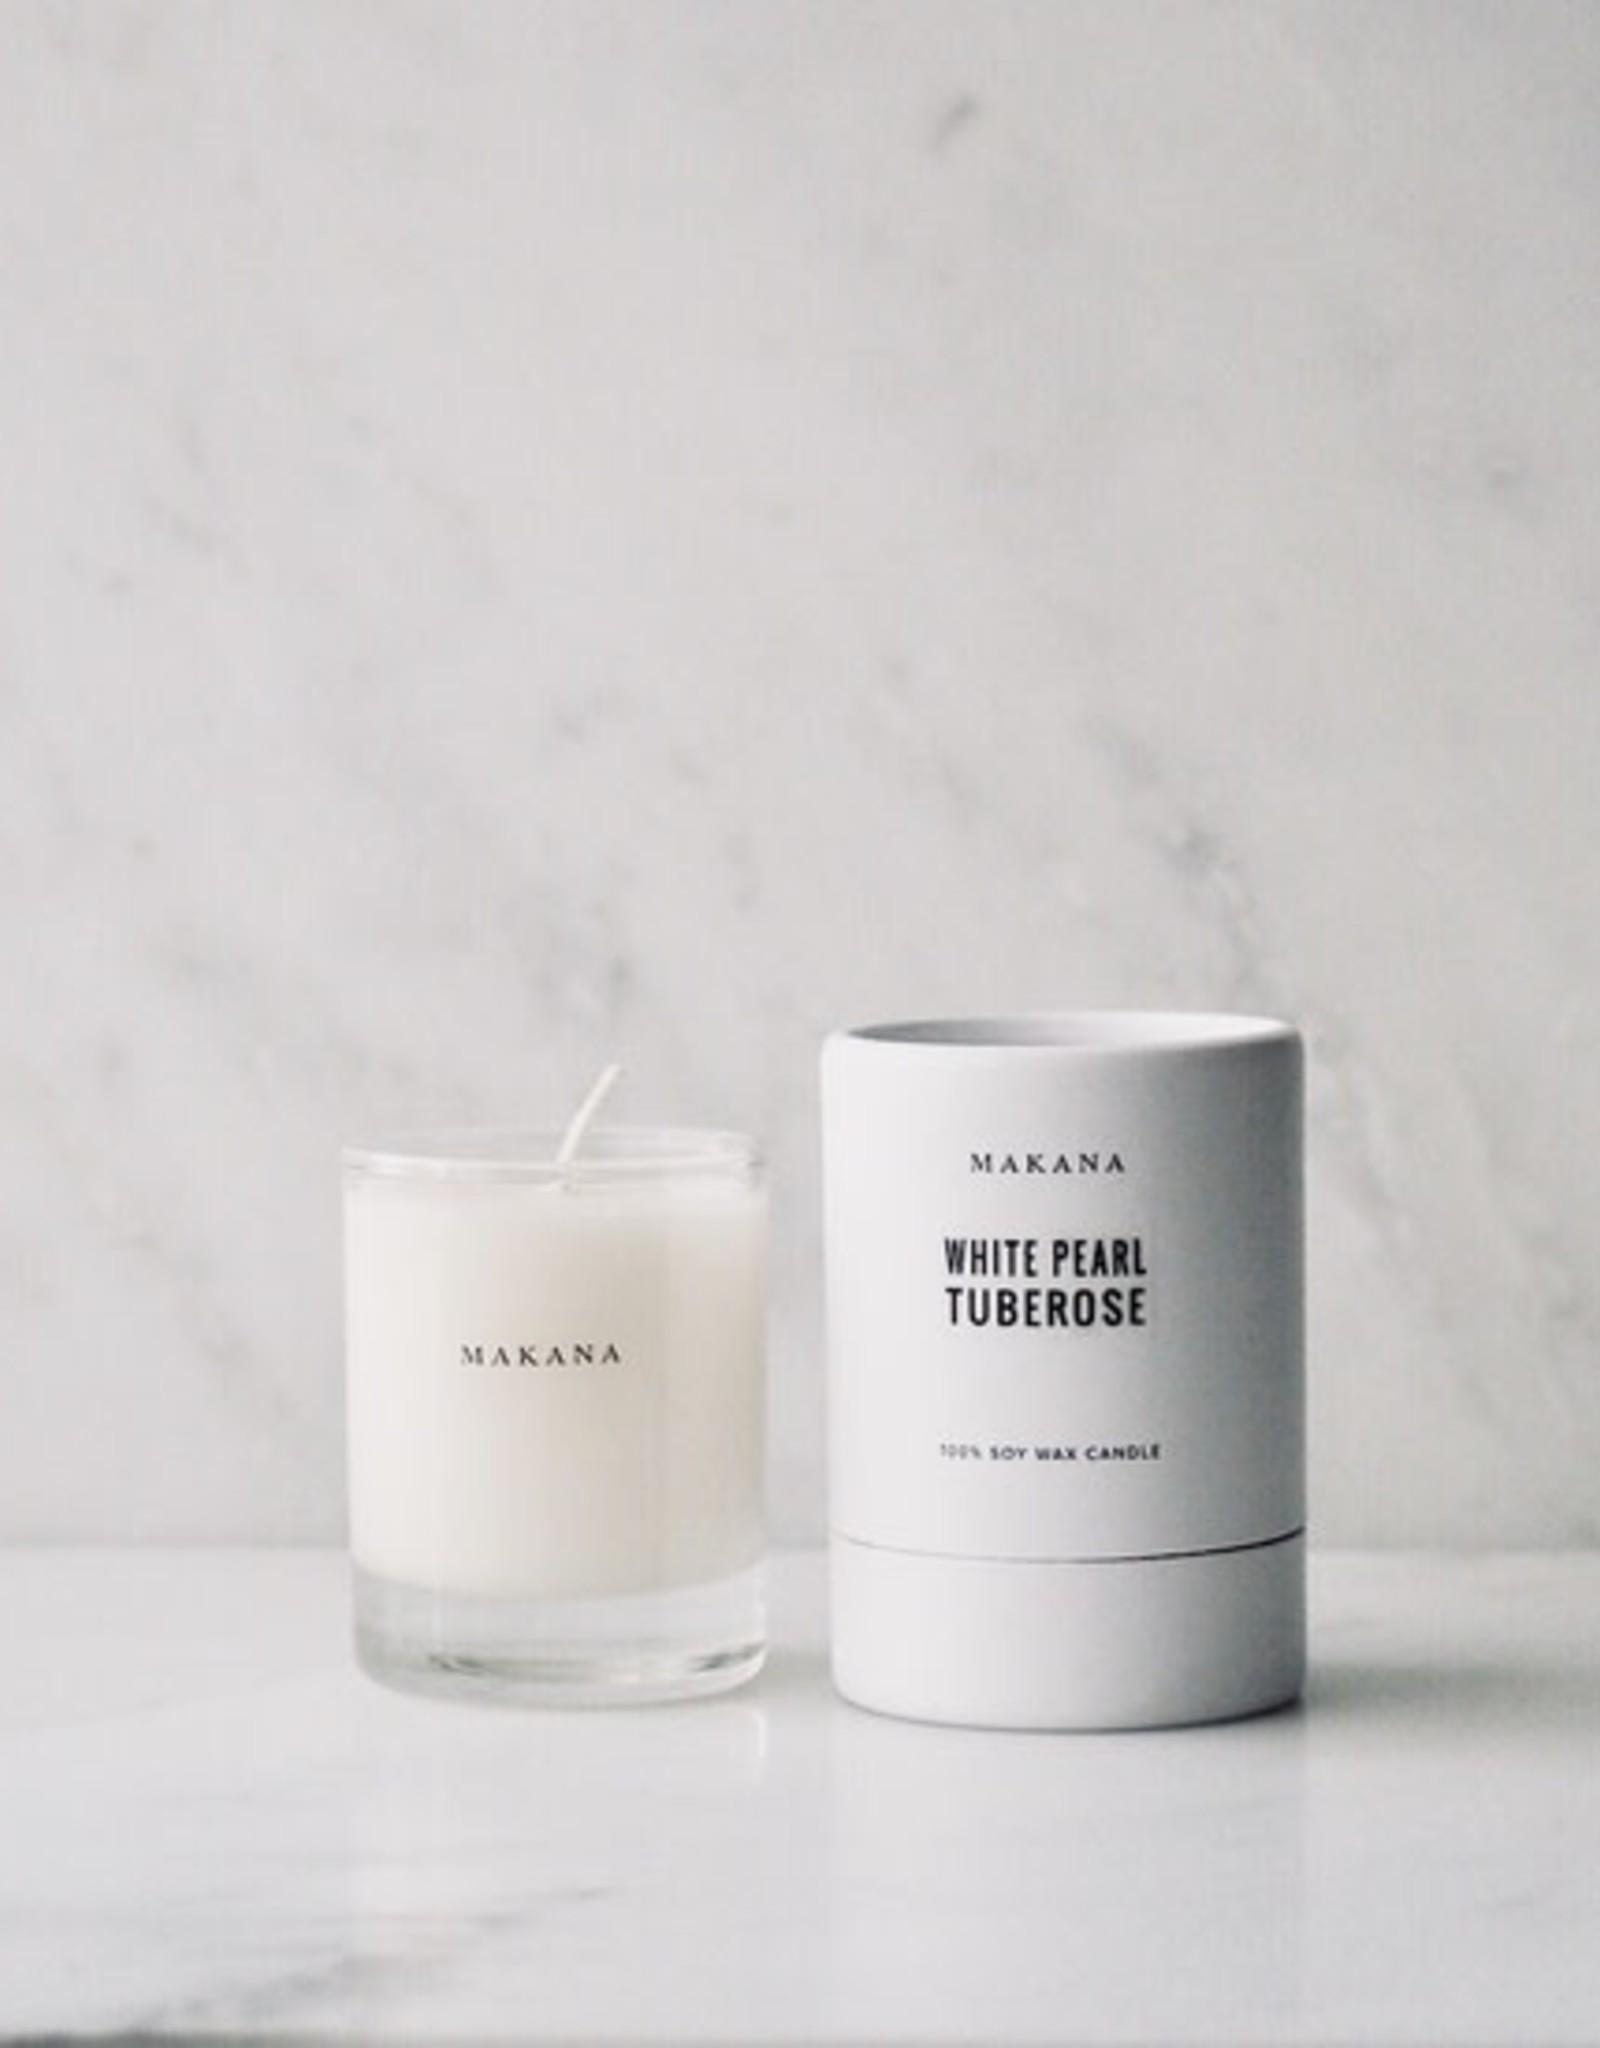 makana White Pearl Tuberose- Petit Candle 3